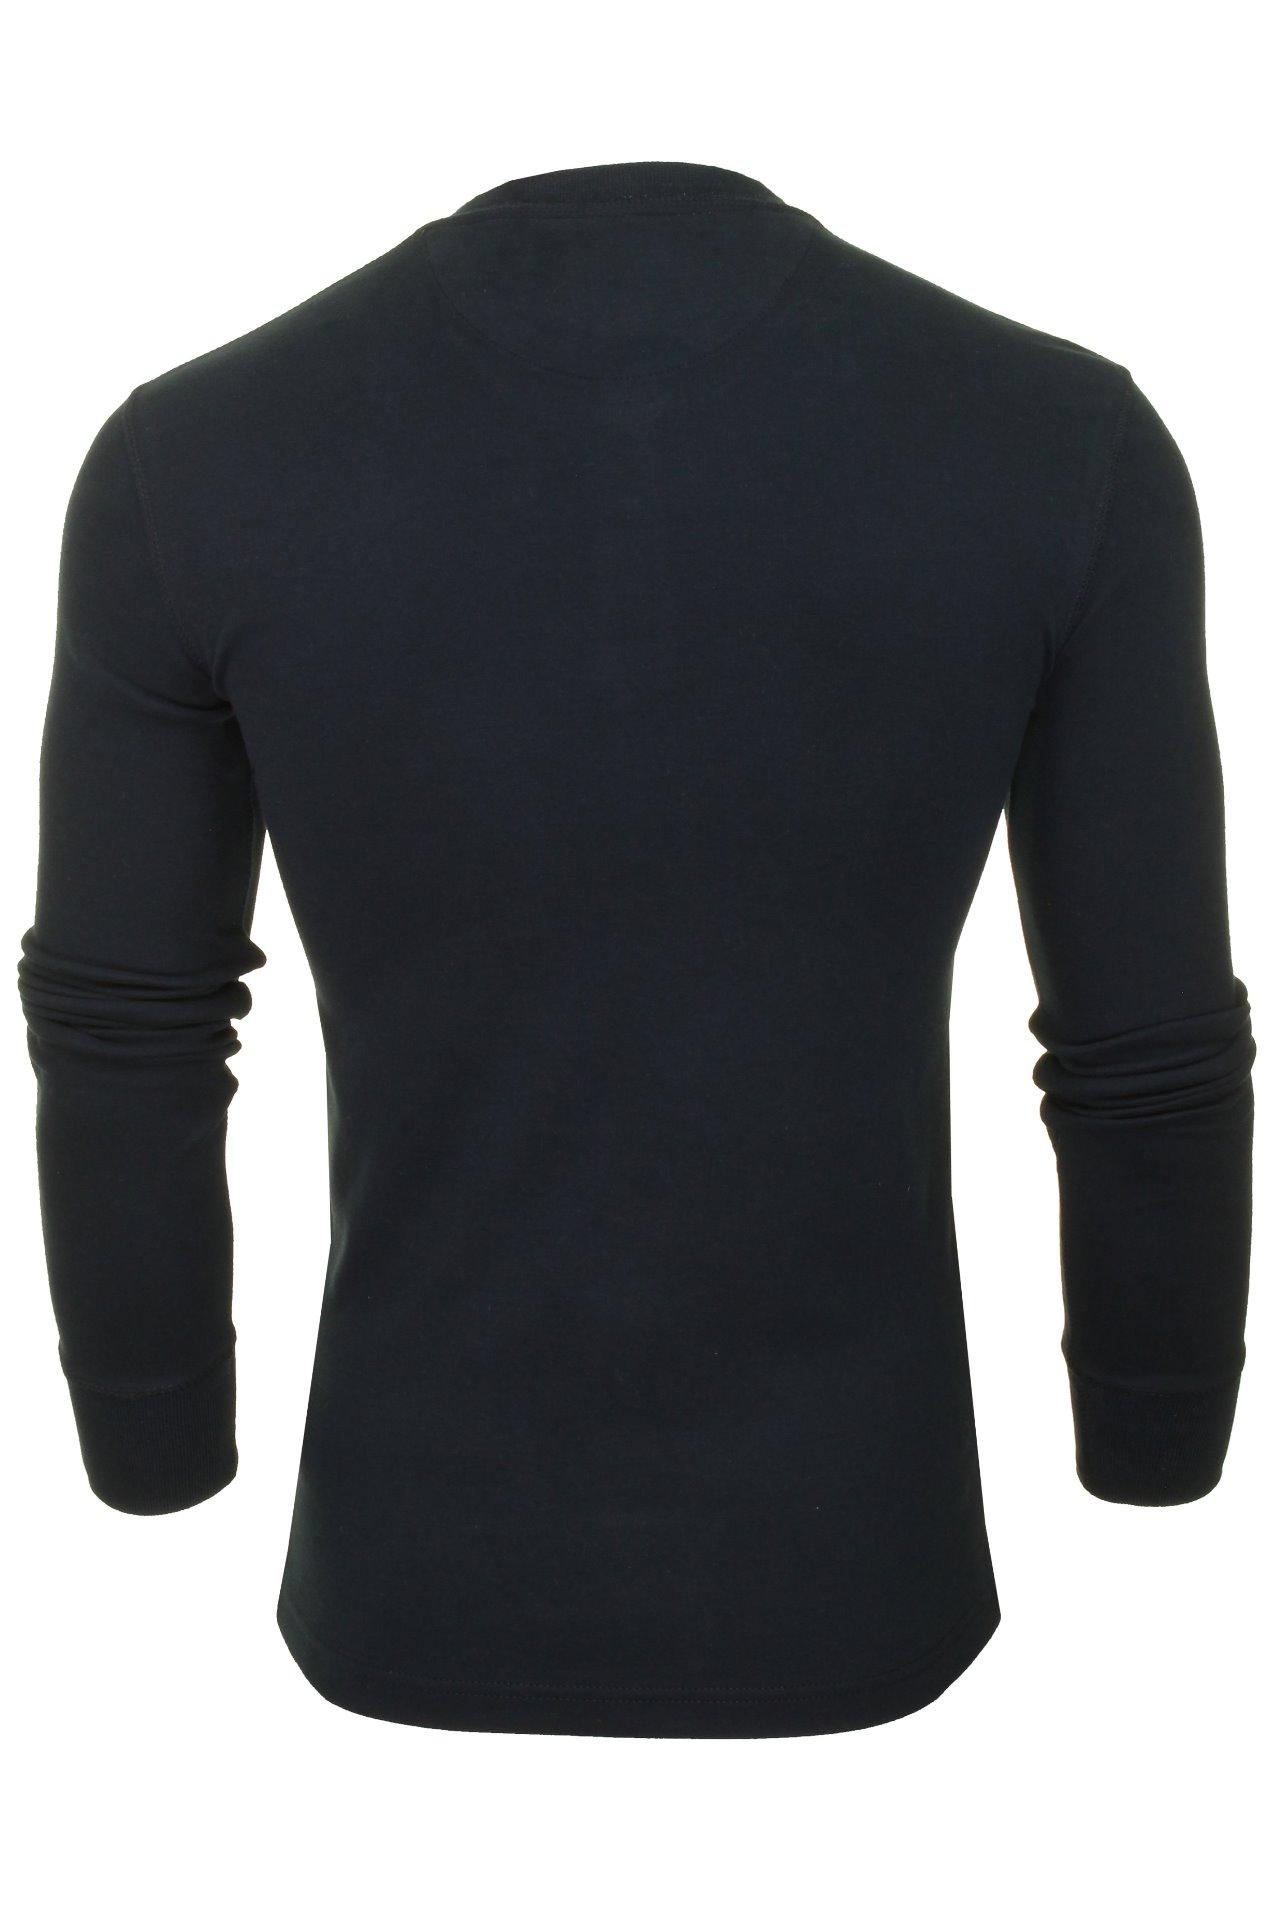 Camisa-de-manga-larga-patrimonio-039-039-Abuelo-T-Shirt miniatura 5